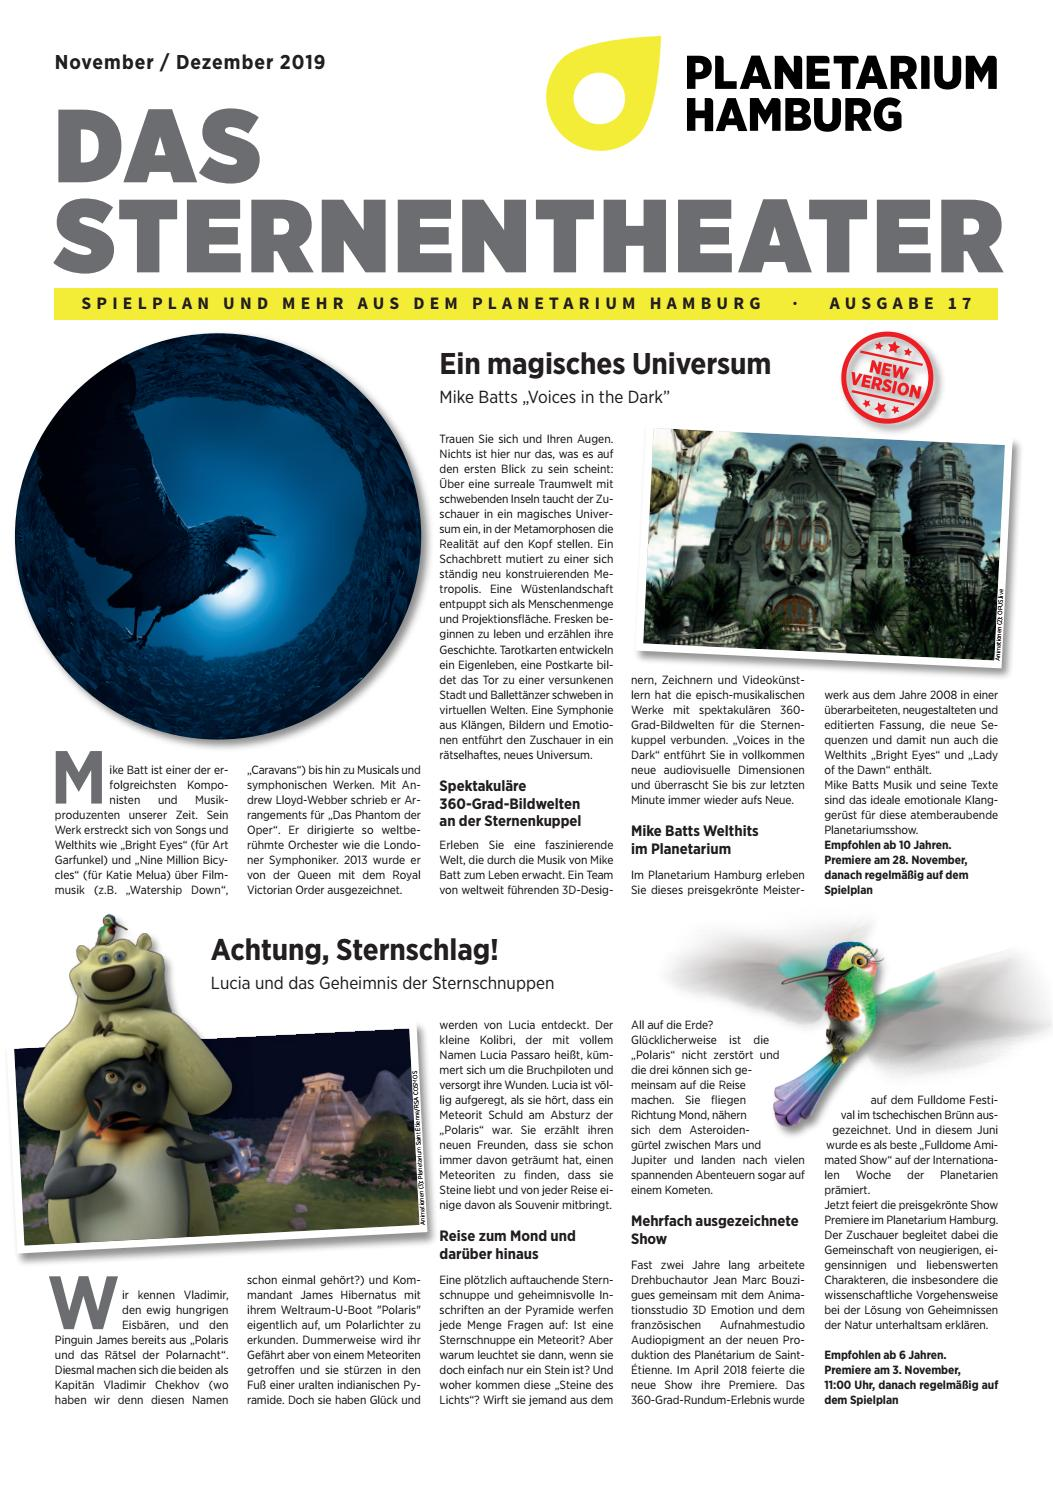 Programm Planetarium Hh November Dezember 2019 By Planetarium Hamburg Issuu